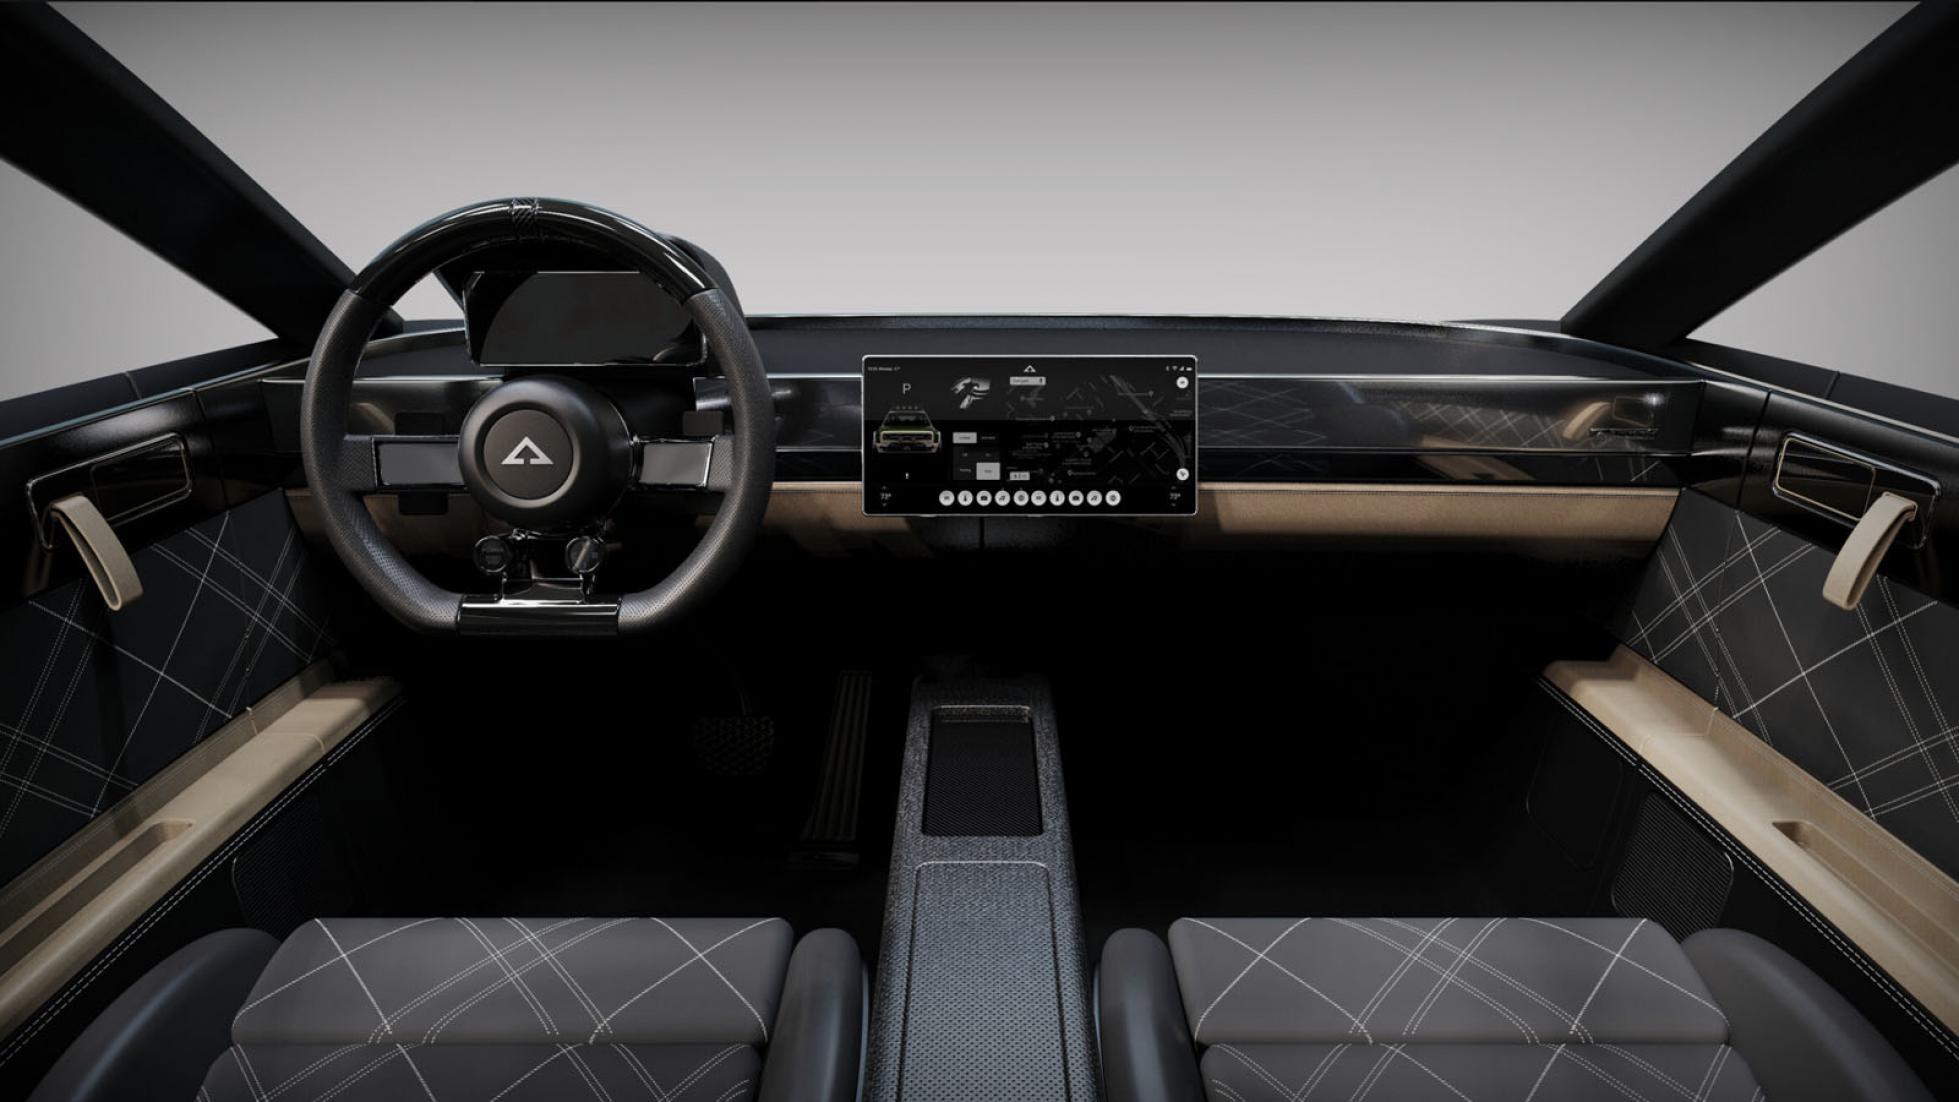 Alpha Jax dashboard front view